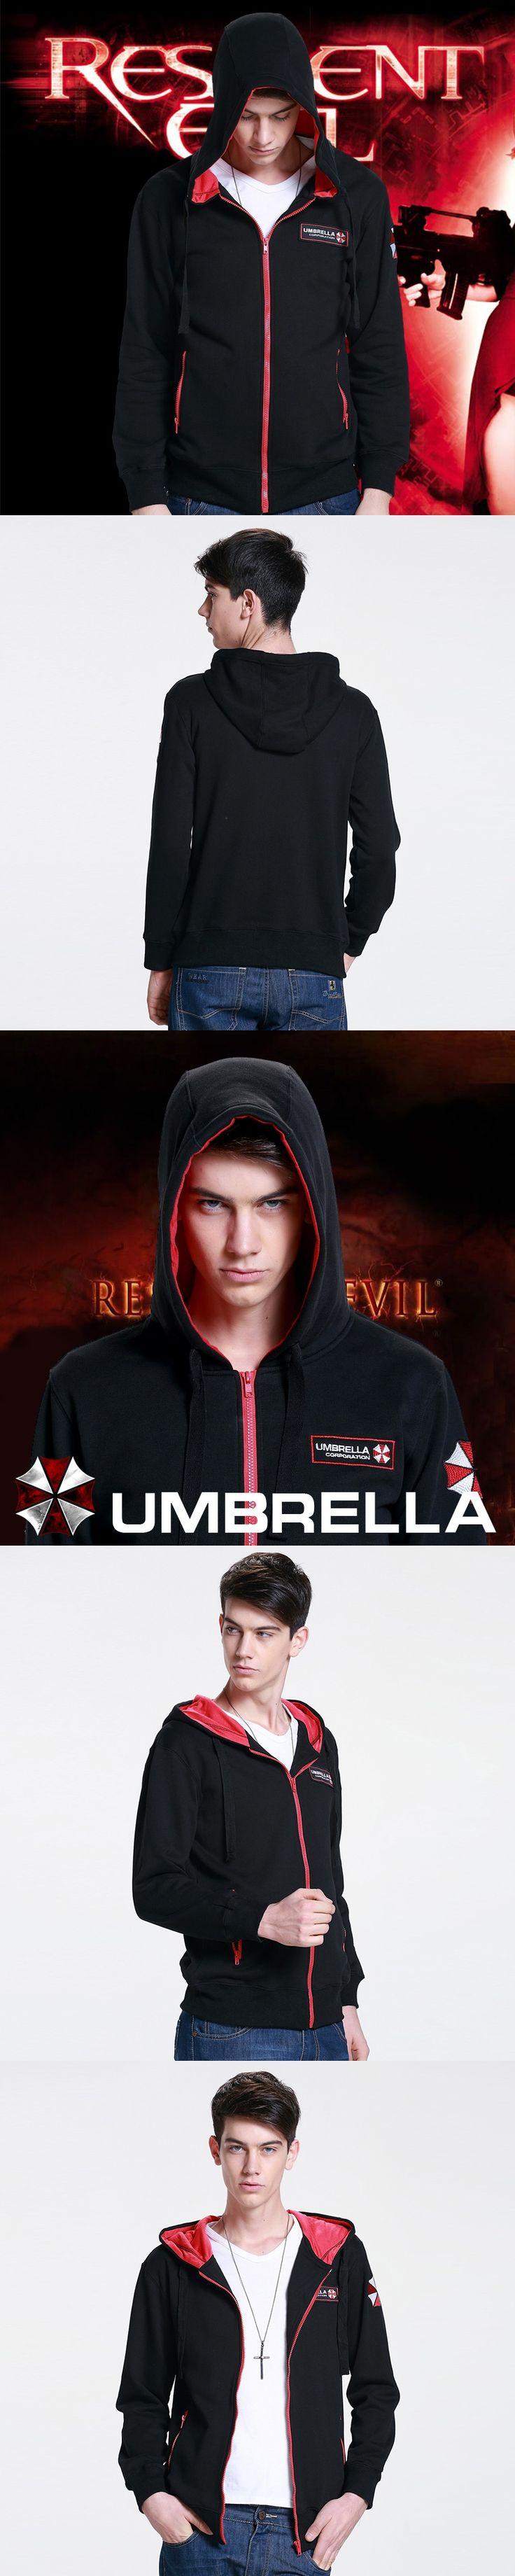 Resident Evil 7 Biohazard The Final Chapter Umbrella Corporation Hoodie Costume Sweatshirt Coat  Mma Hoodie